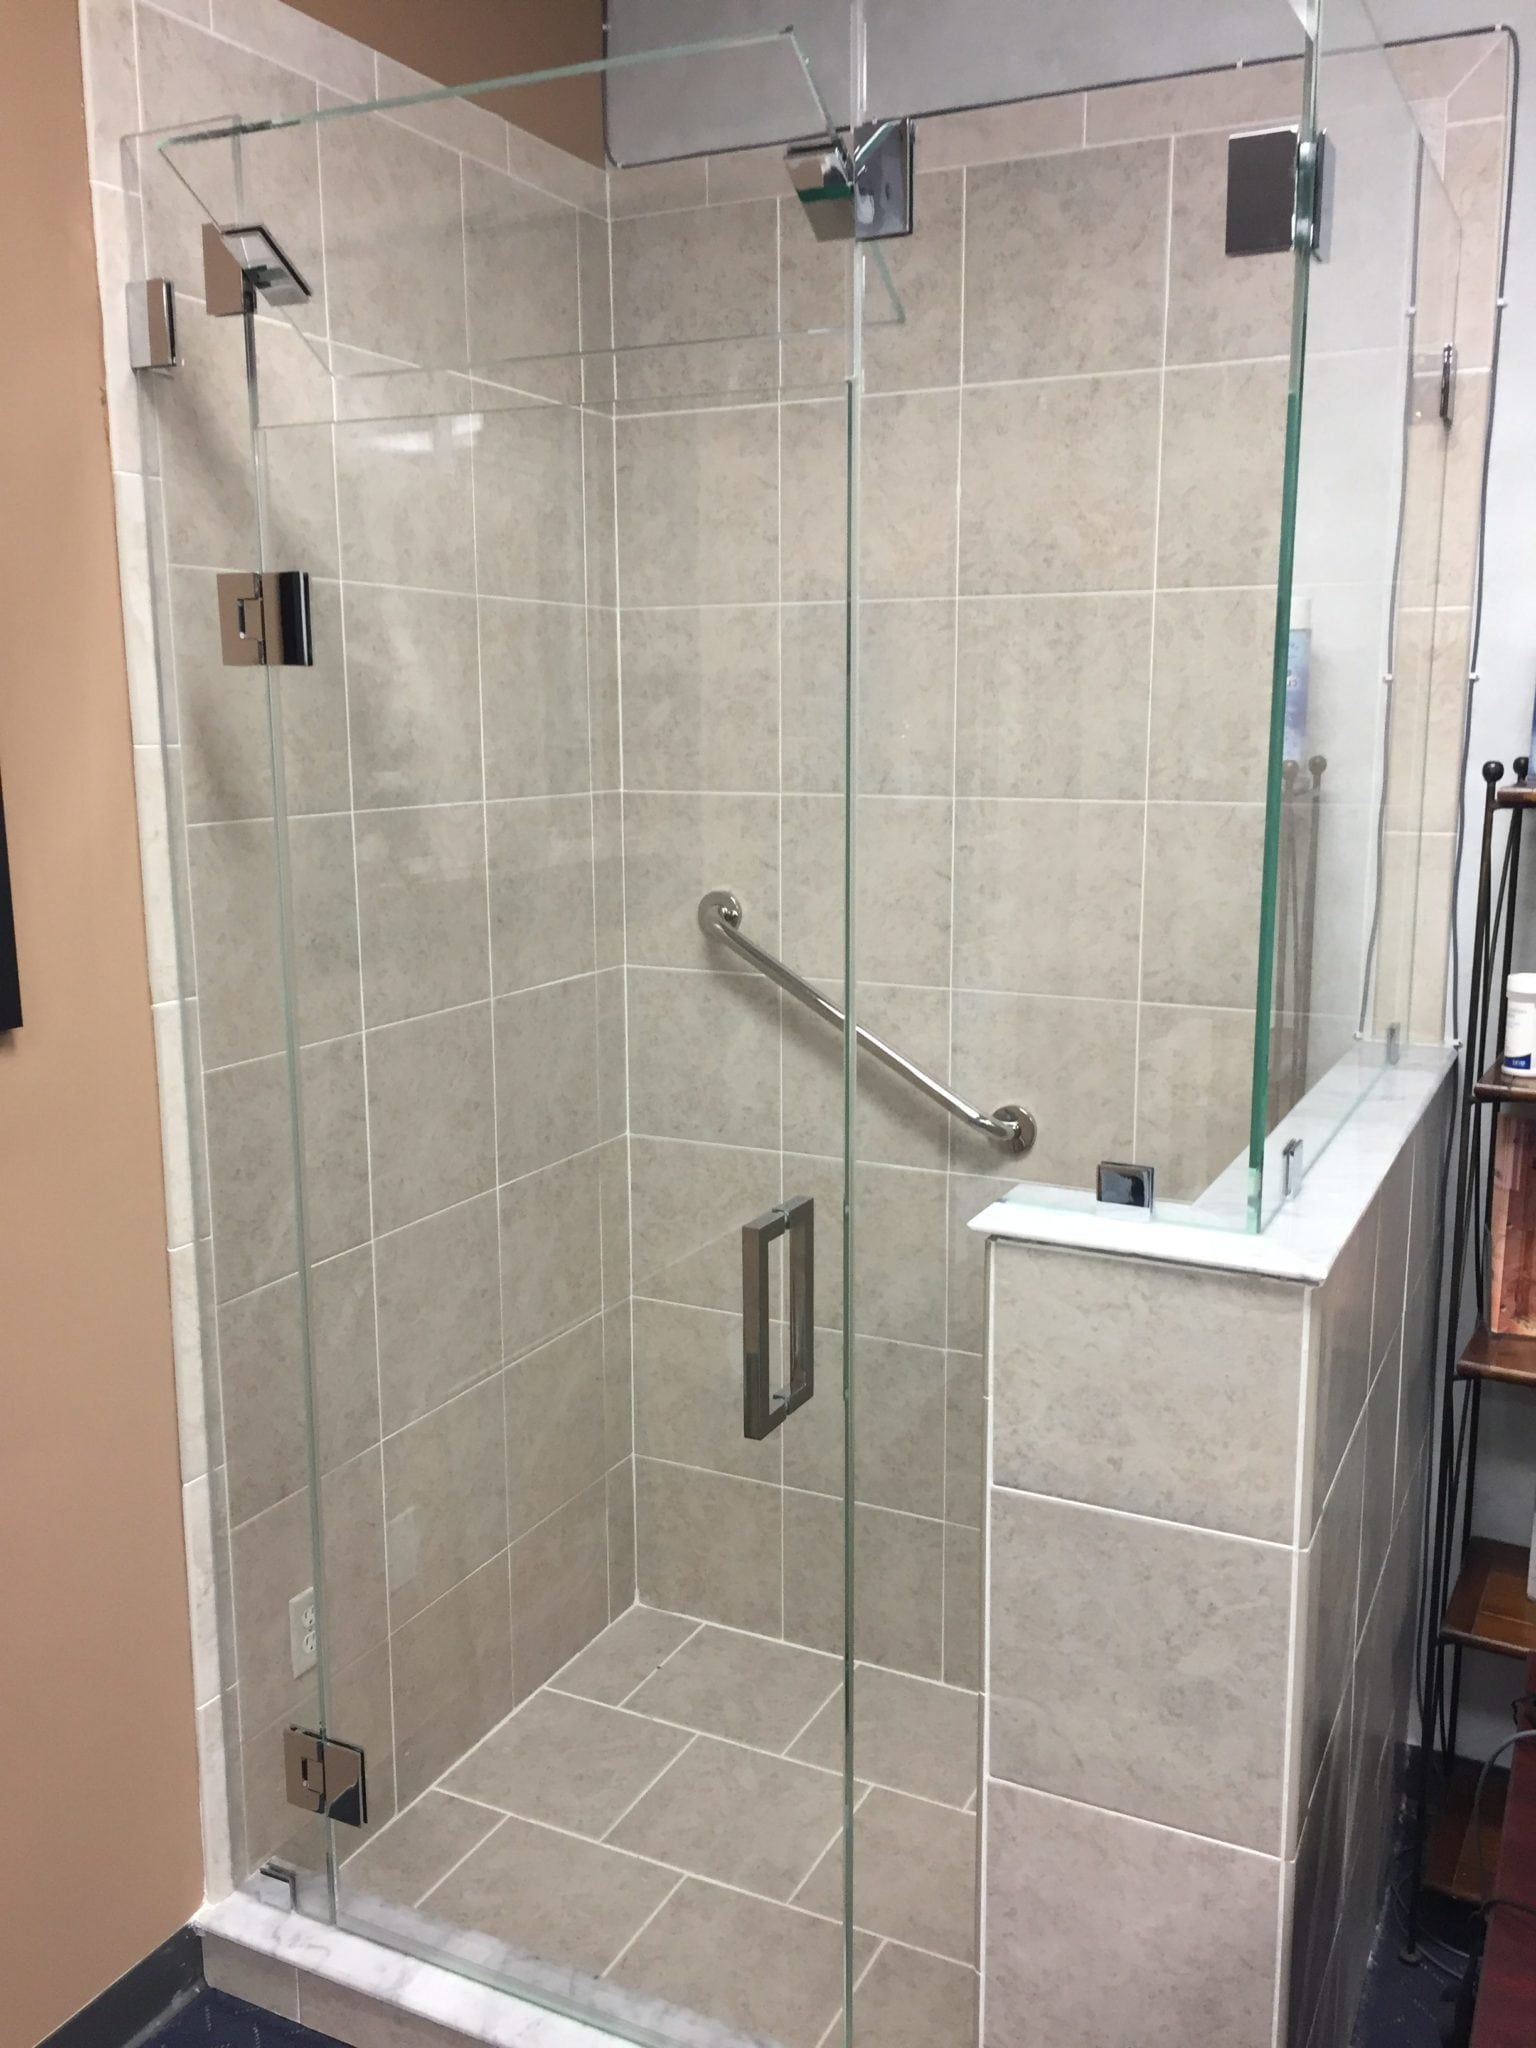 Frameless Shower Door with Opening Transom & Frameless Shower Door with Opening Transom - Absolute Shower Doors